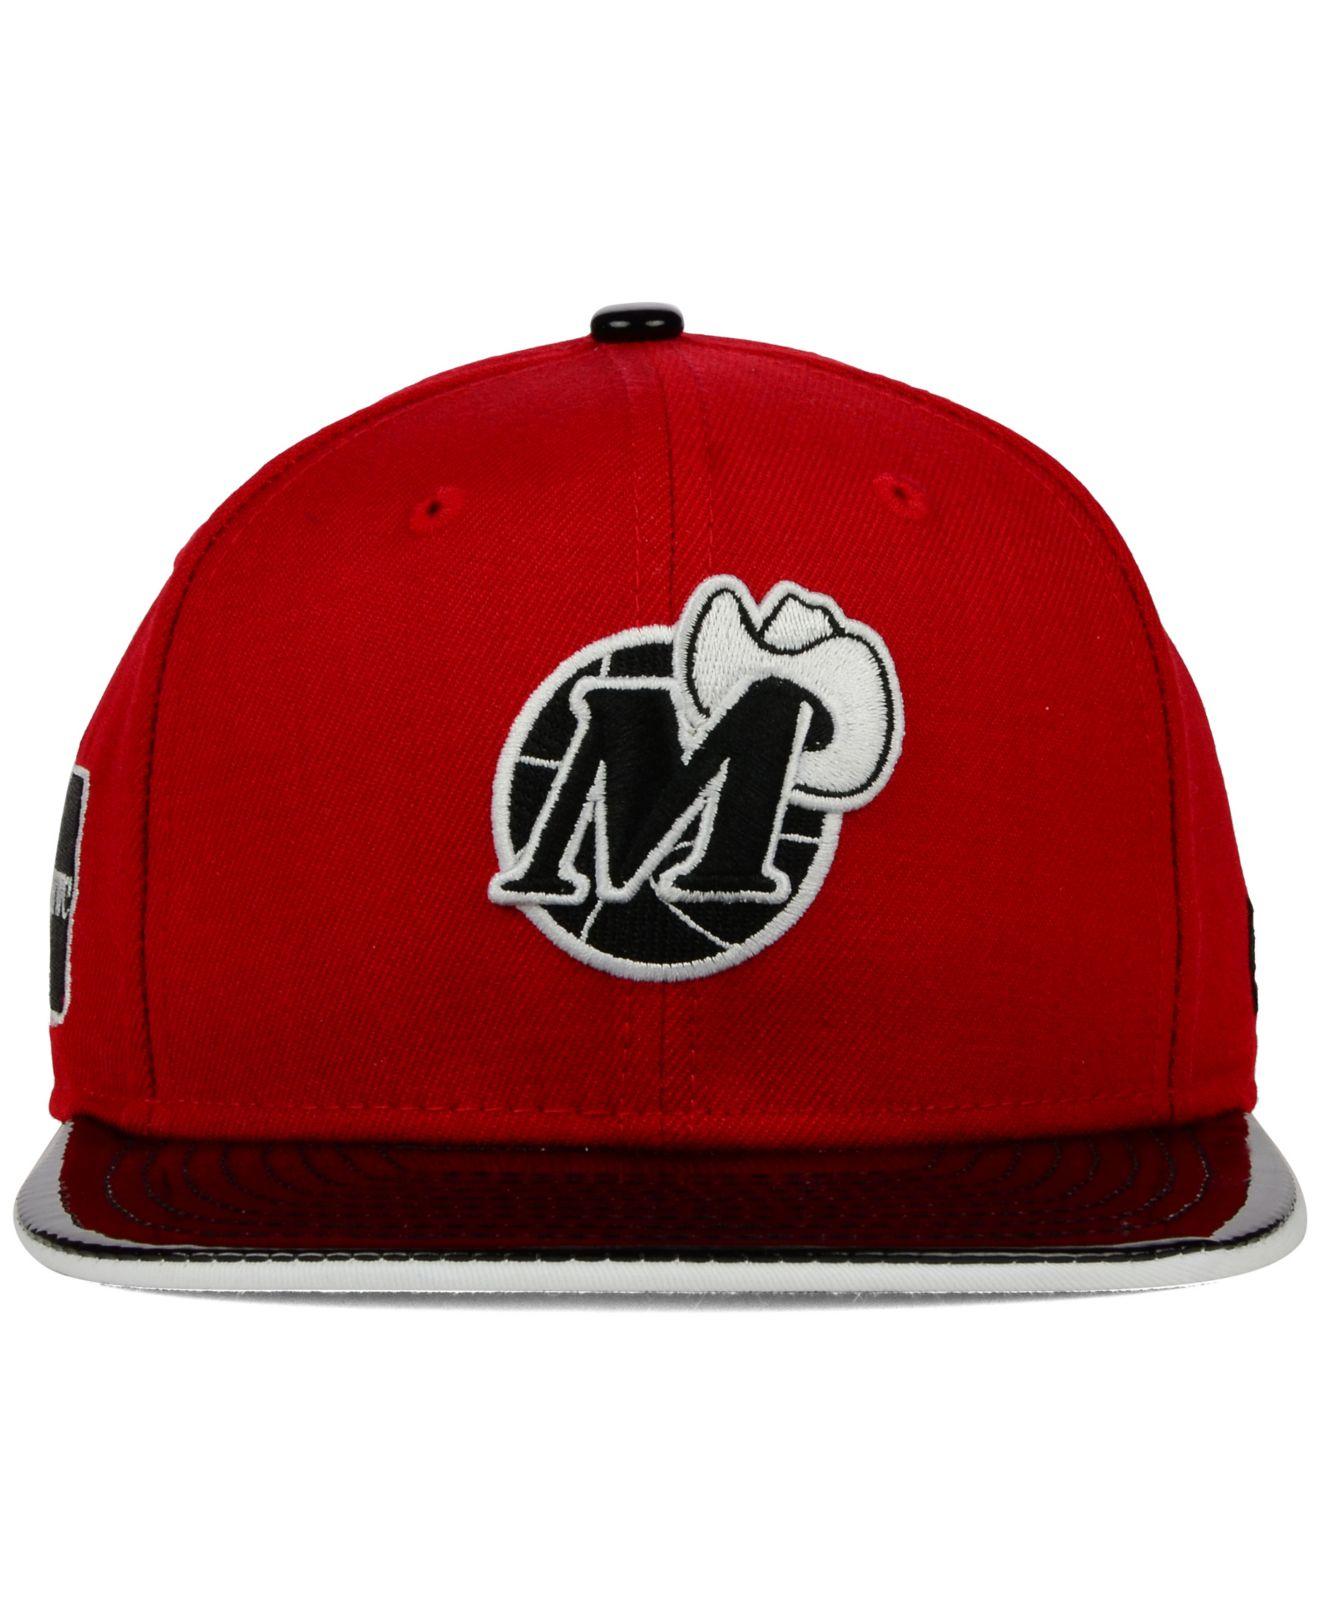 new product 543a5 d7241 KTZ Dallas Mavericks Bred Hookup 9fifty Snapback Cap in Red for Men ...